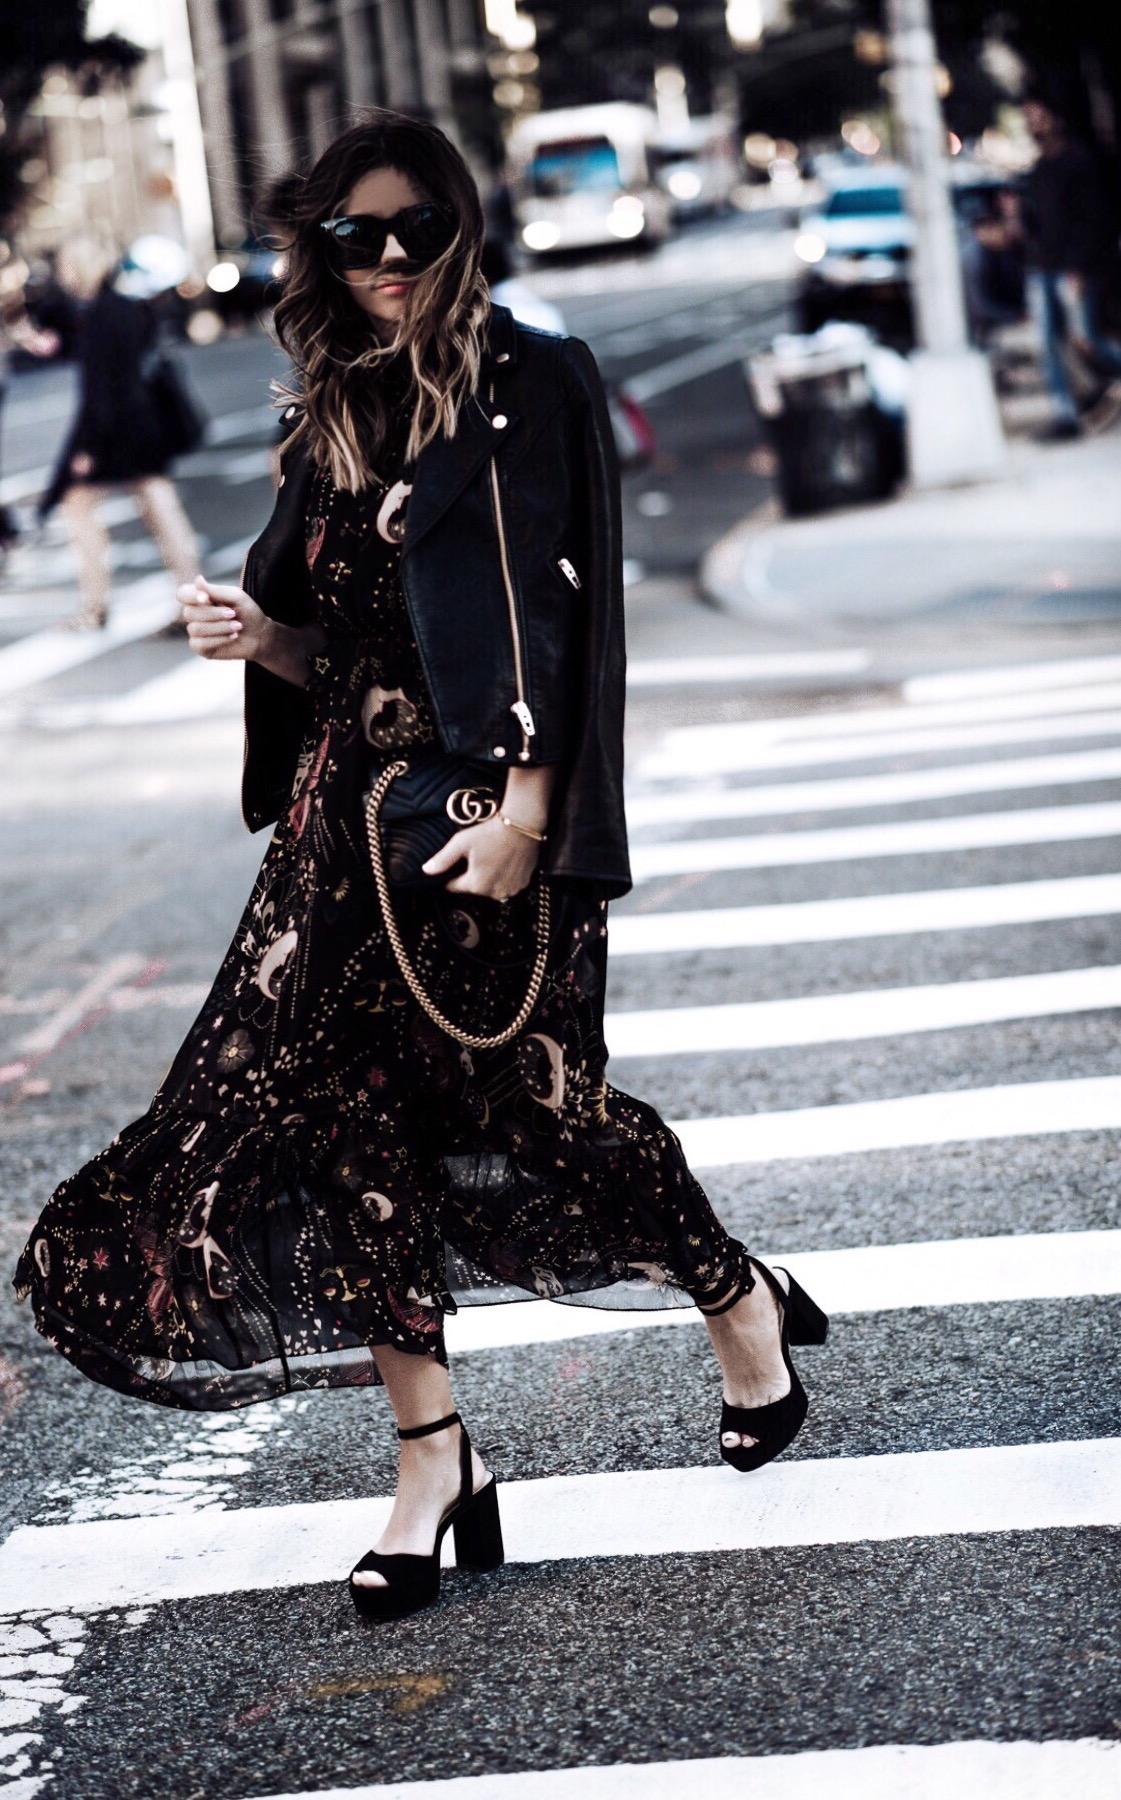 Tiffany Jais fashion and lifestyle blogger of Flaunt and Center | NYFW | Zara floral dress | Black moto jacket